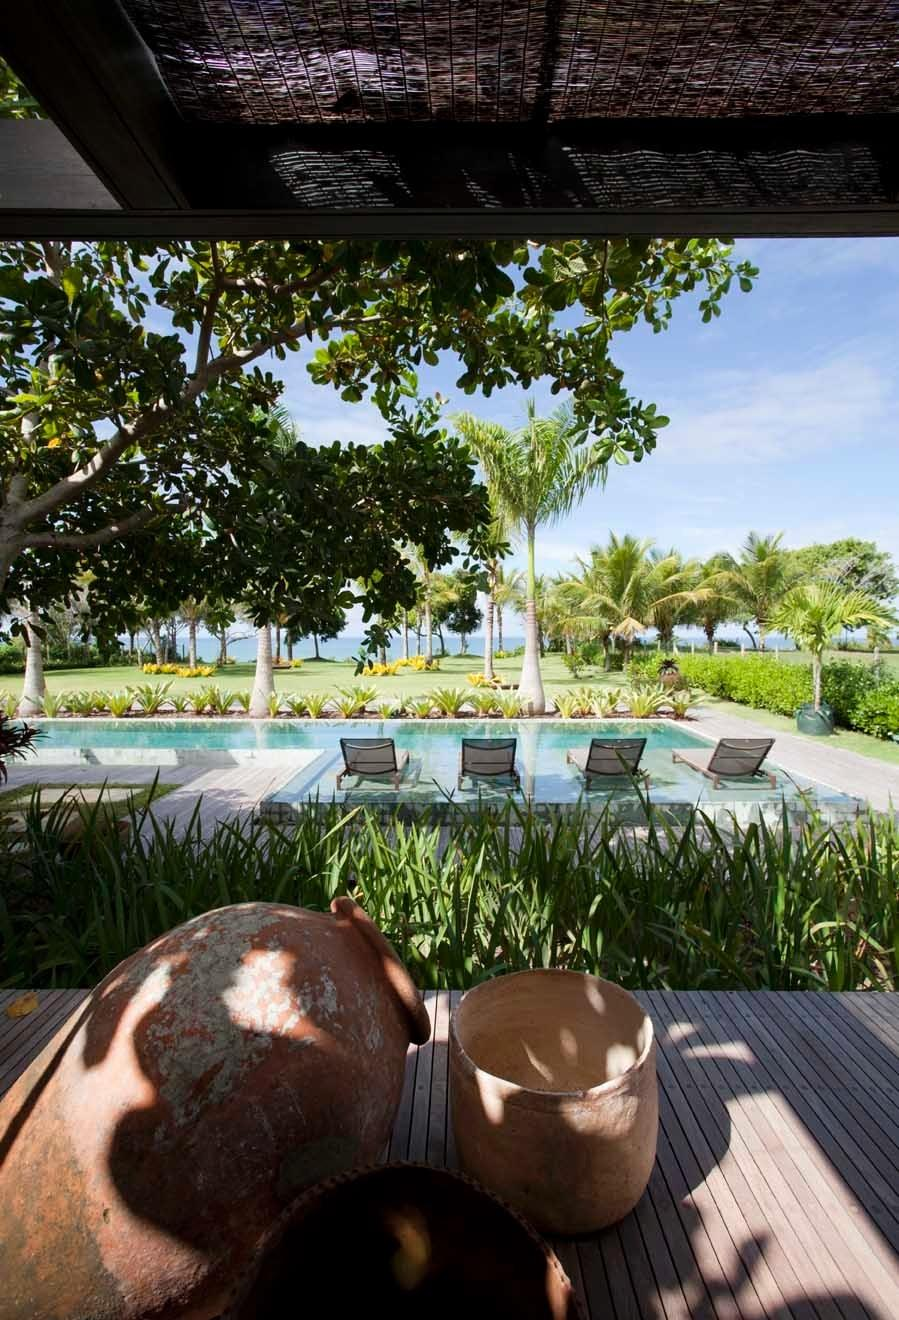 Do deck de madeira da varanda na suíte máster, o casal de moradores pode descansar e usufruir da vista da piscina e do mar de Trancoso (BA). Quem assina a arquitetura da casa Areia é Debora Aguiar